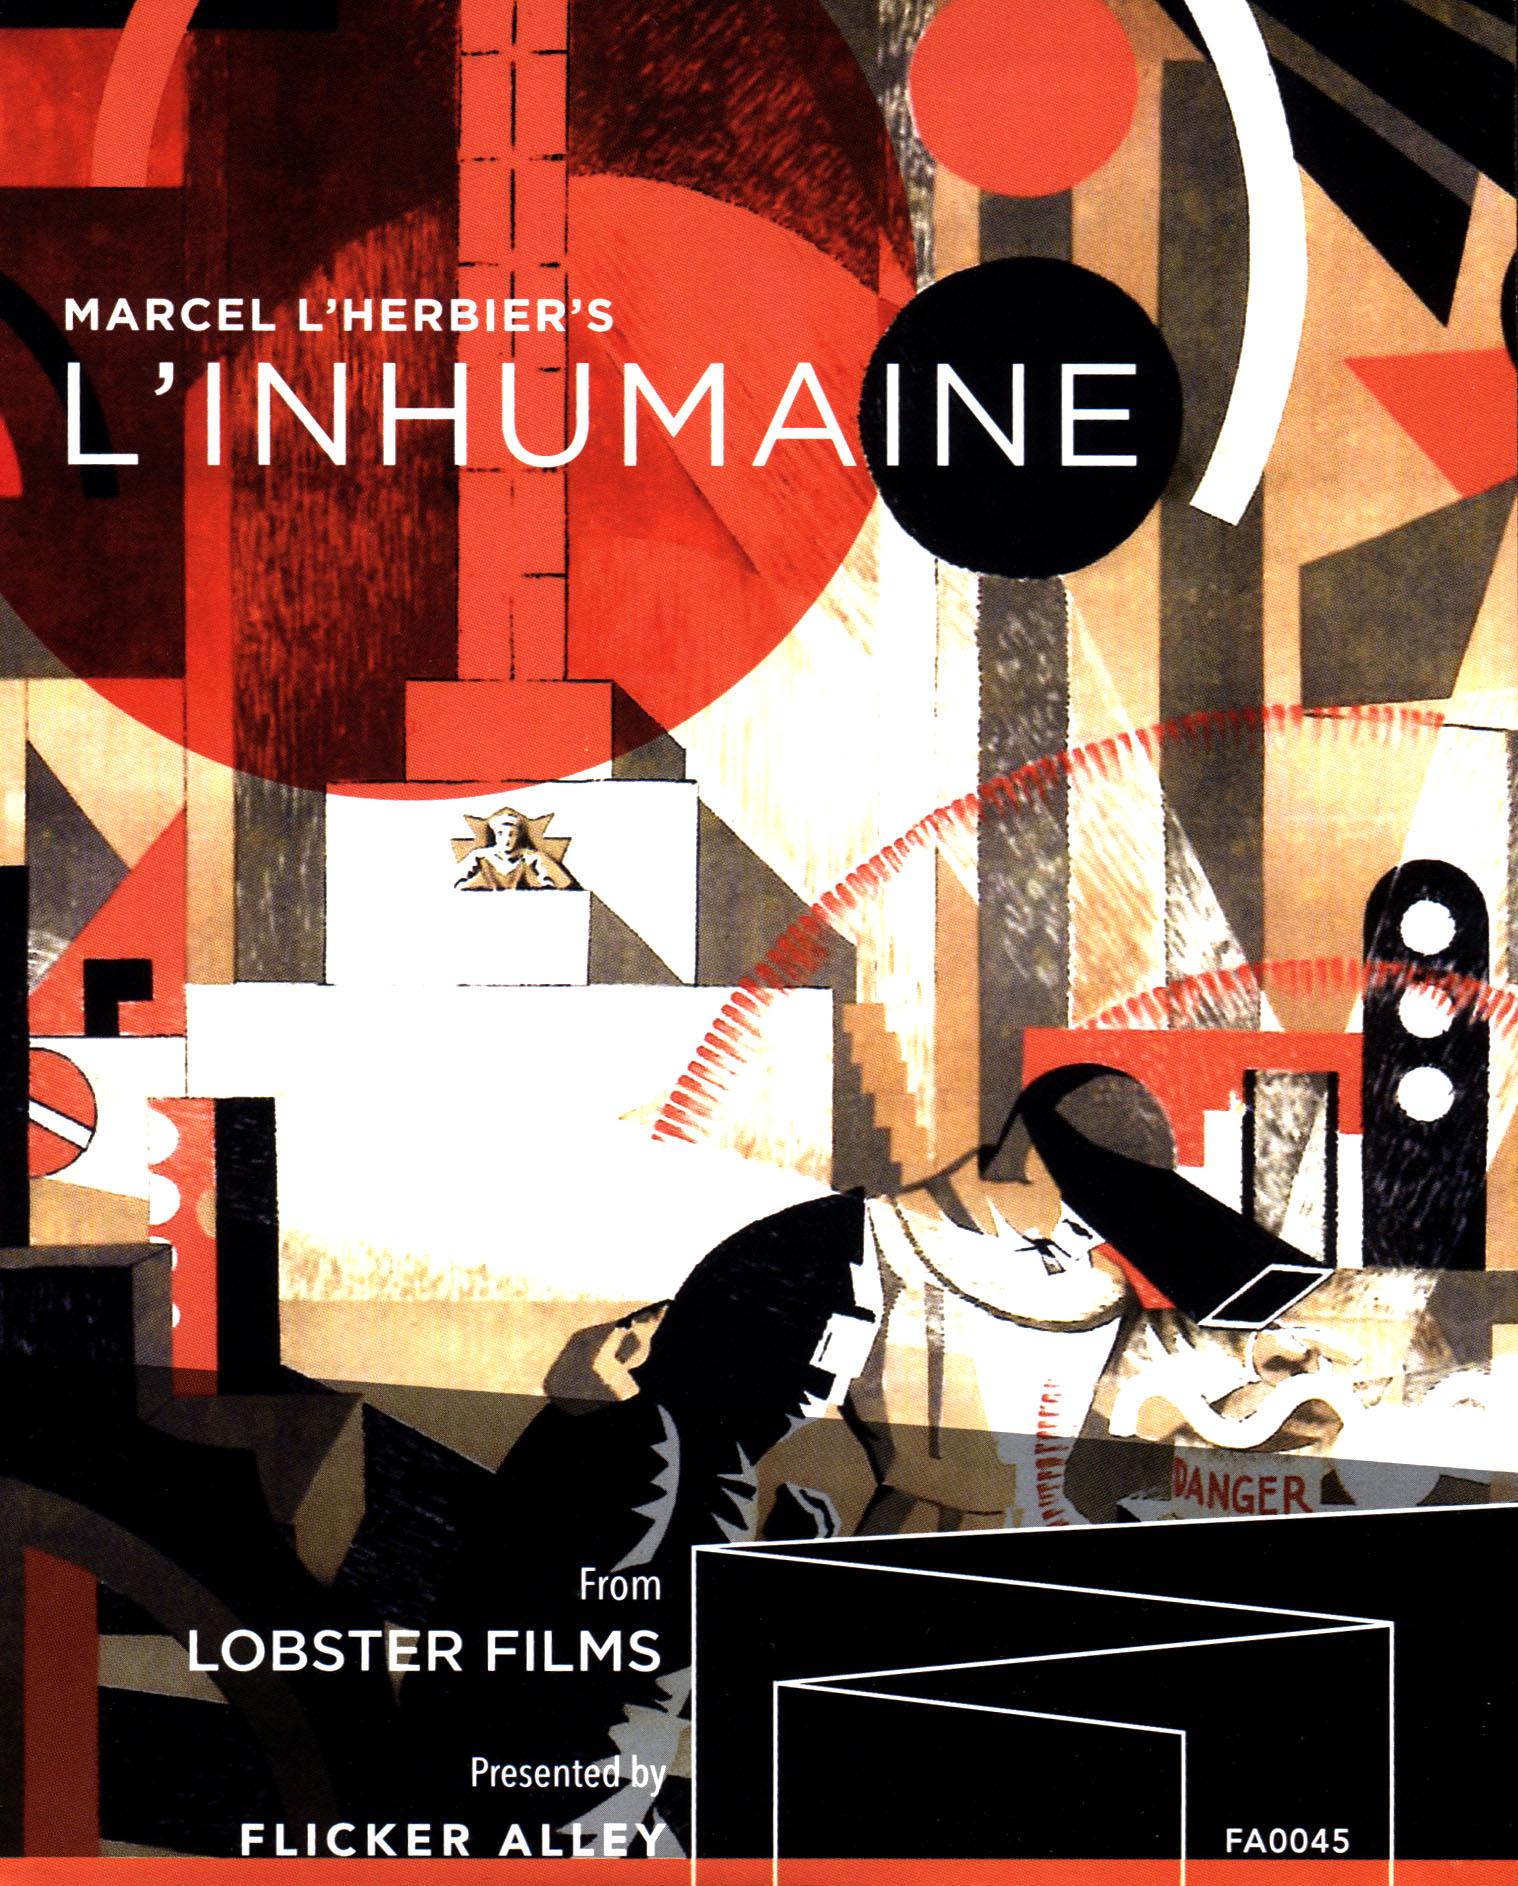 L'inhumaine [blu-ray] 30109862